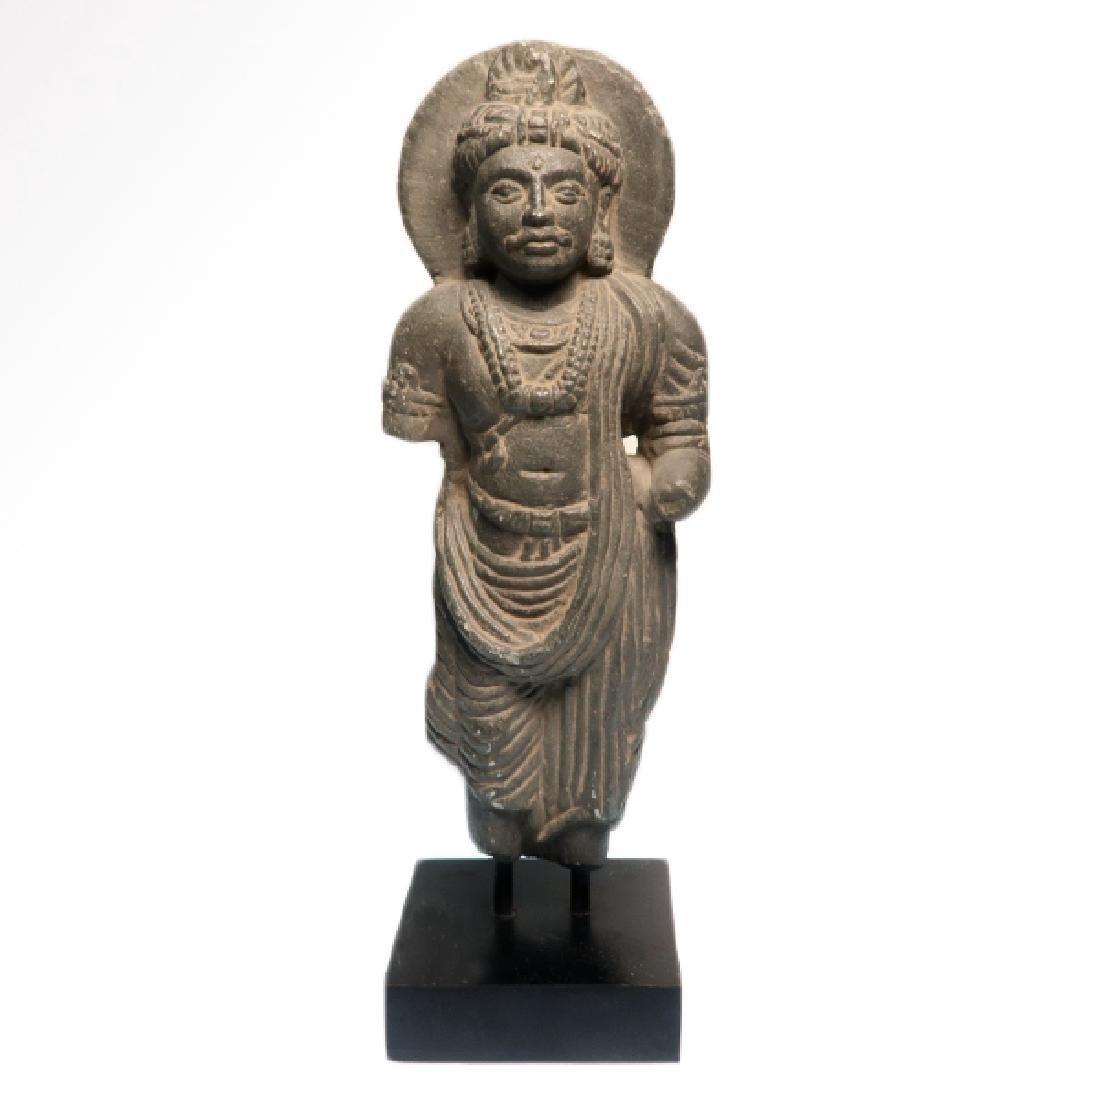 Gandhara Schist Figure of a Standing Buddha, c. 2nd-3rd